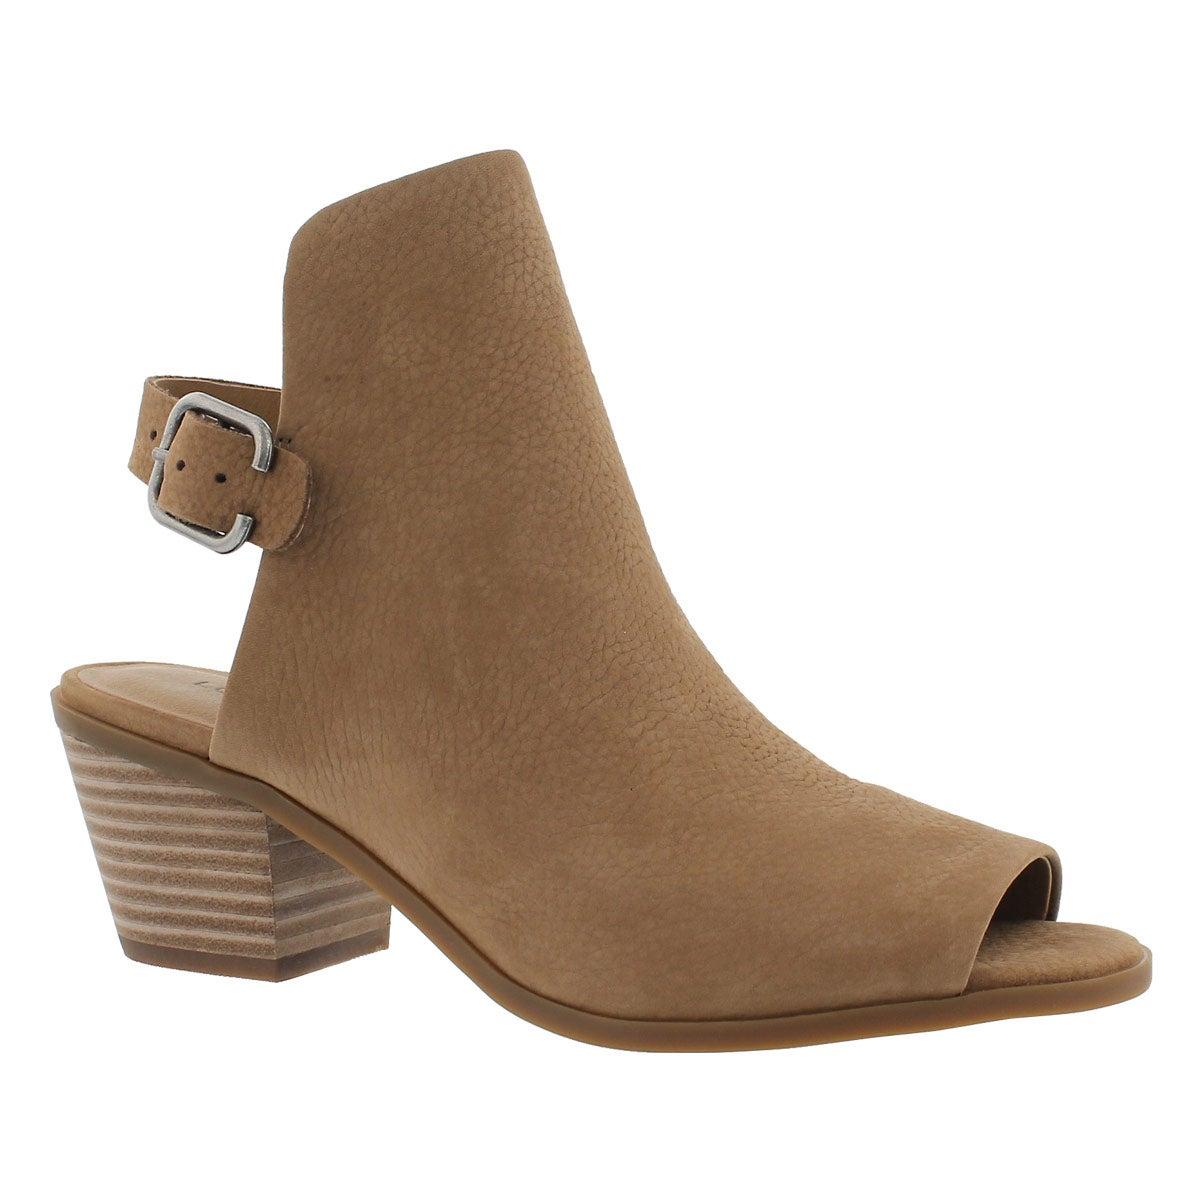 Women's BRAY sesame casual sandals